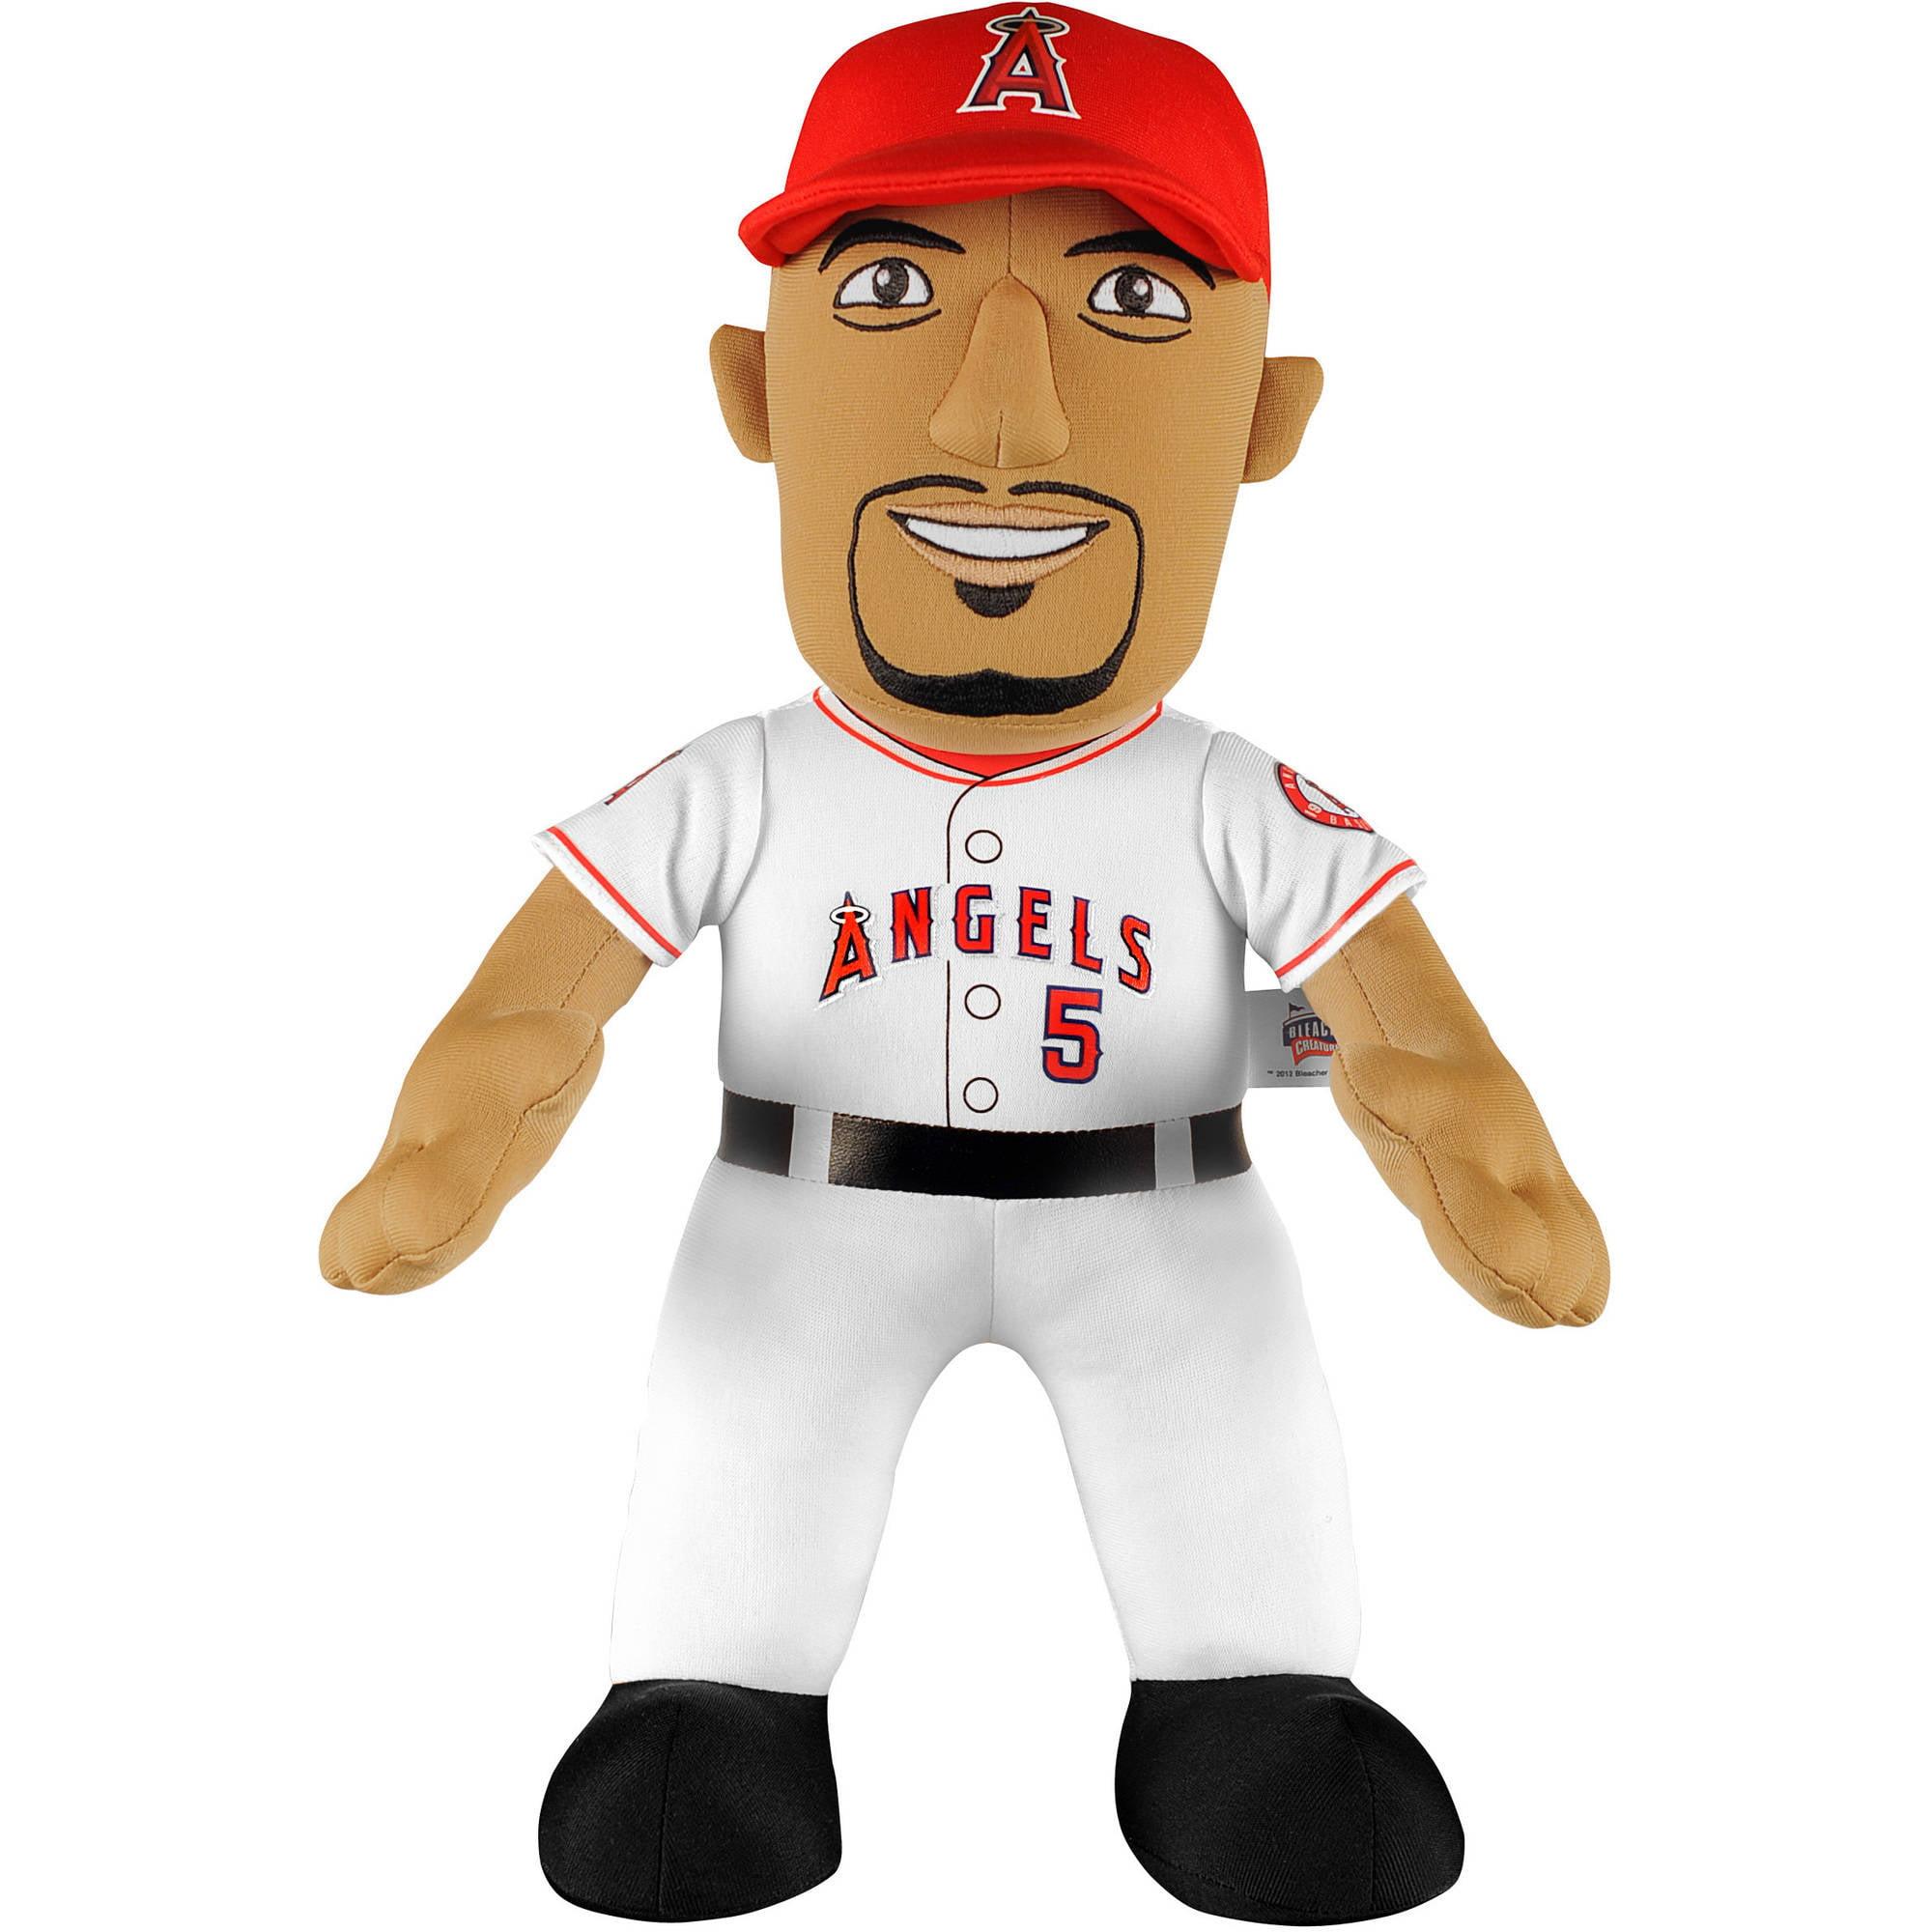 "Bleacher Creatures MLB 14"" Plush Doll, Albert Pujols, Los Angeles Angels"